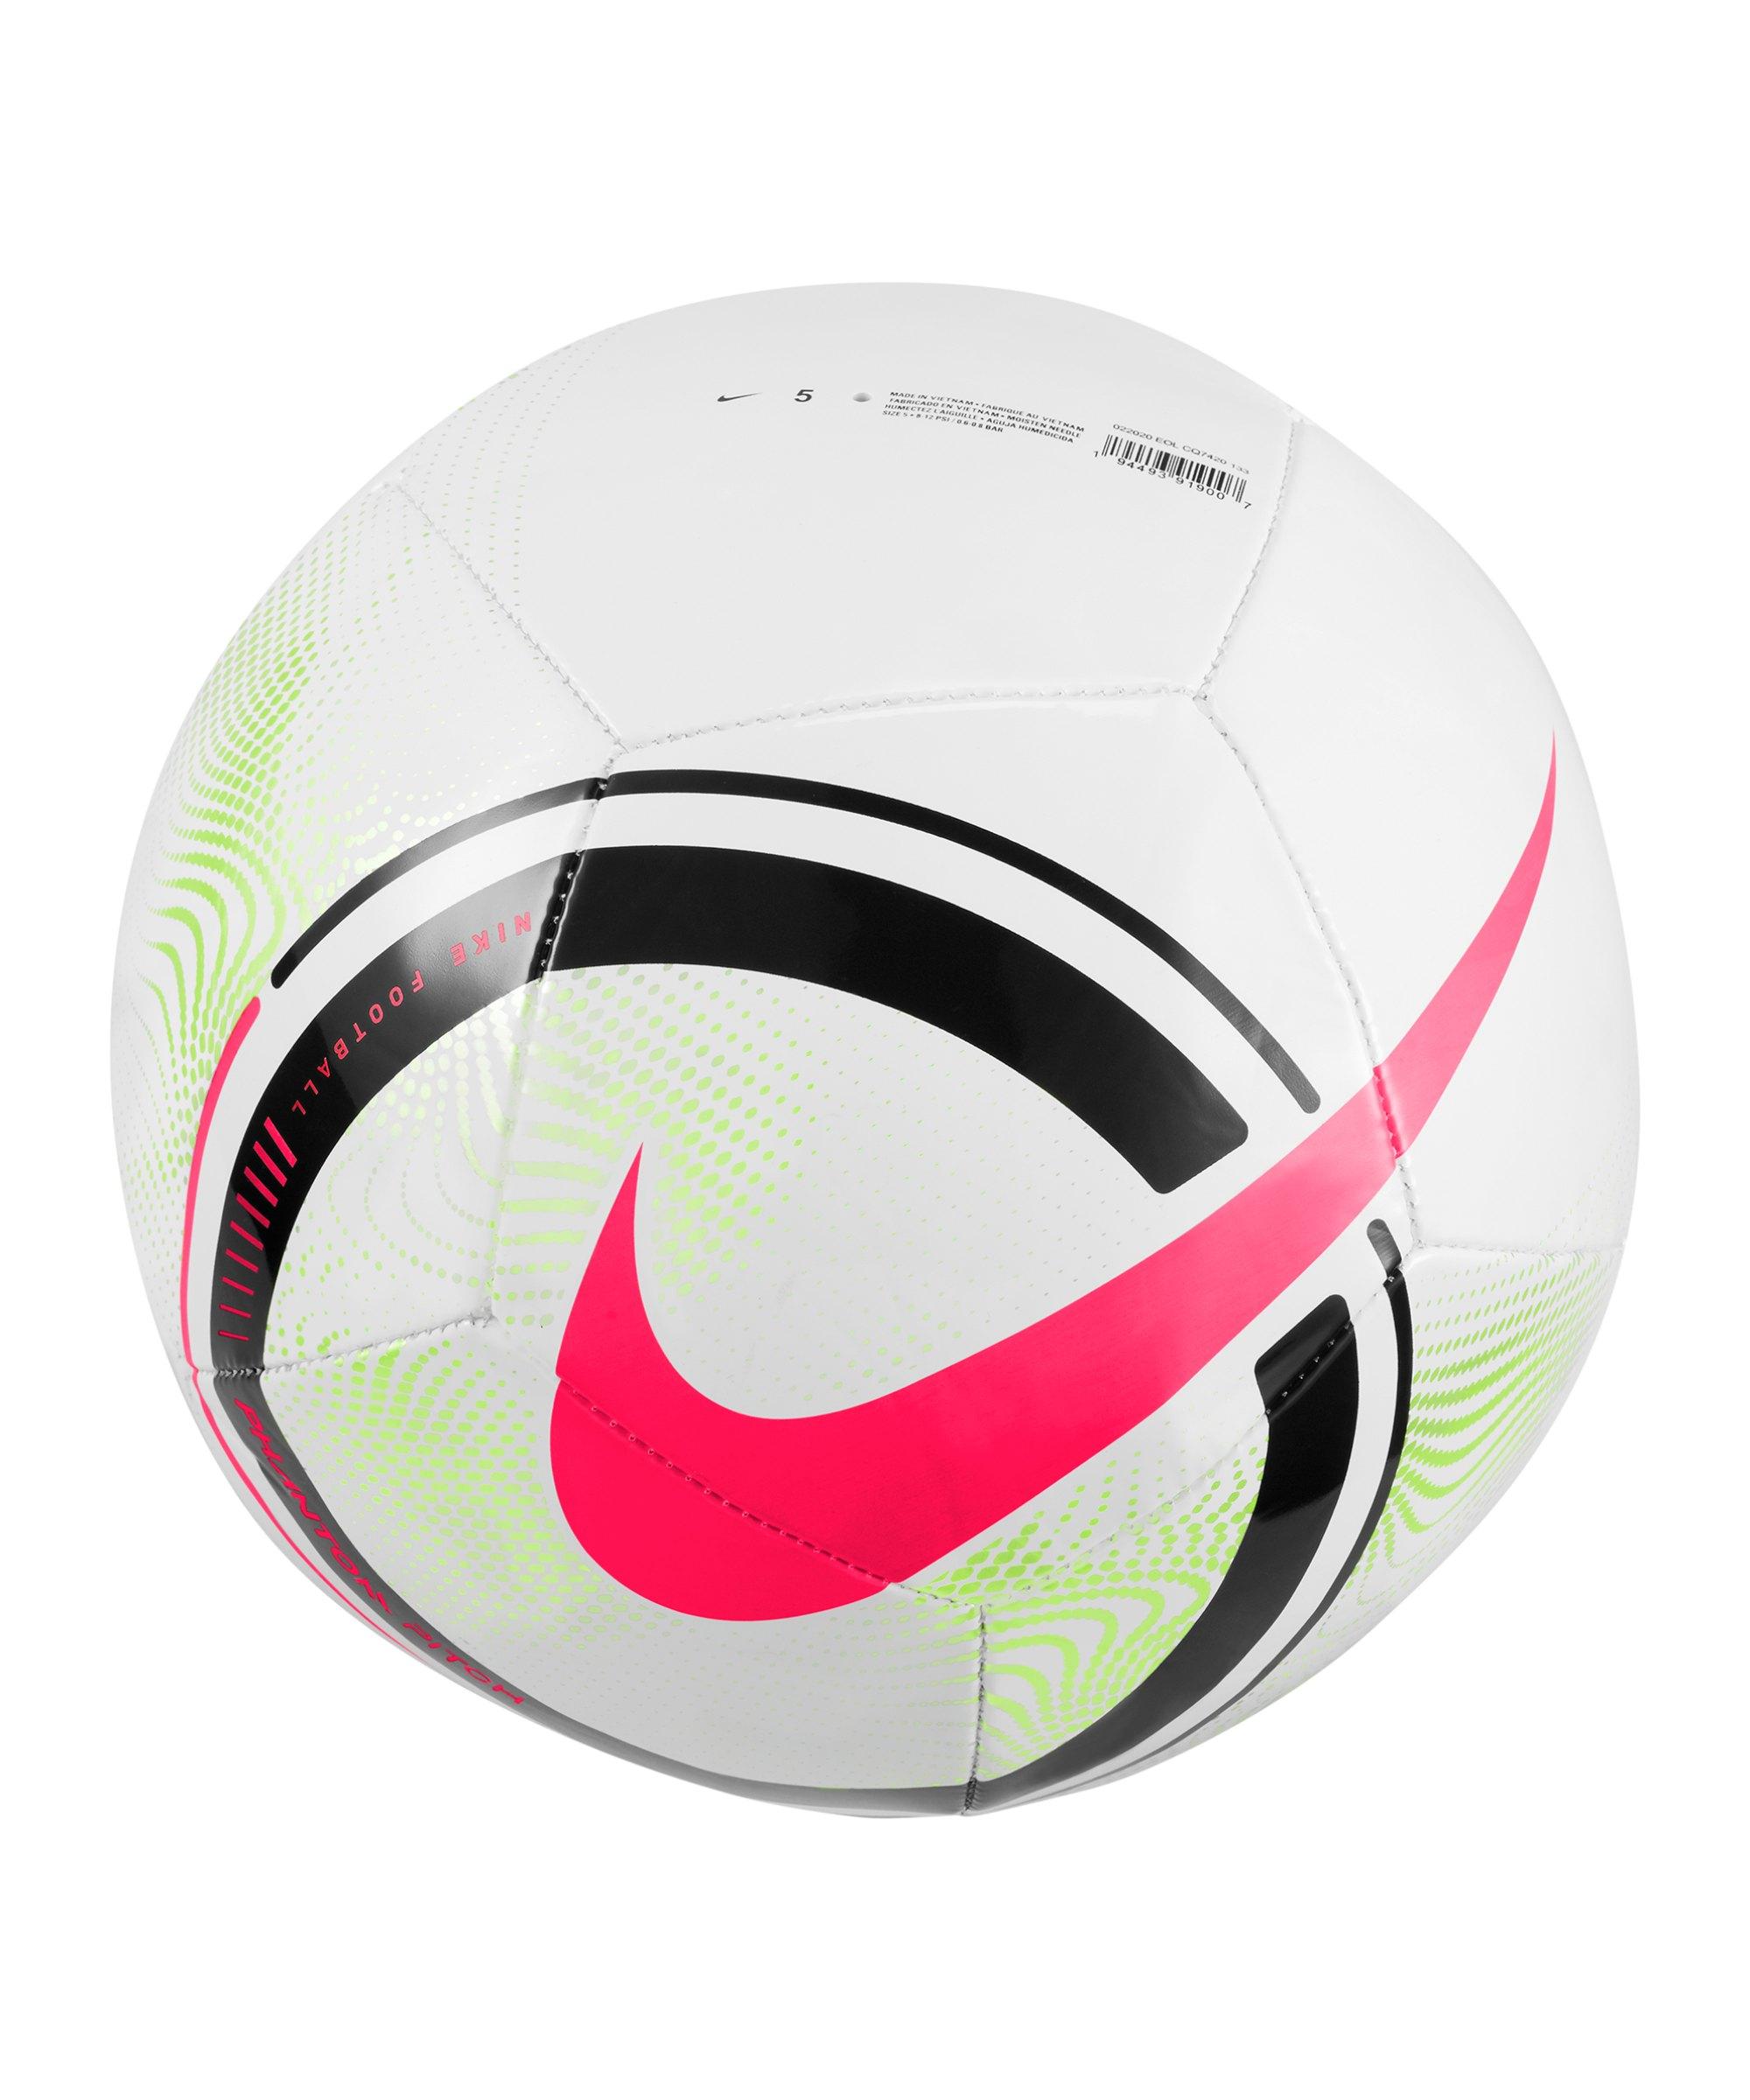 Nike Phantom Trainingsball Weiss Gelb F100 - weiss